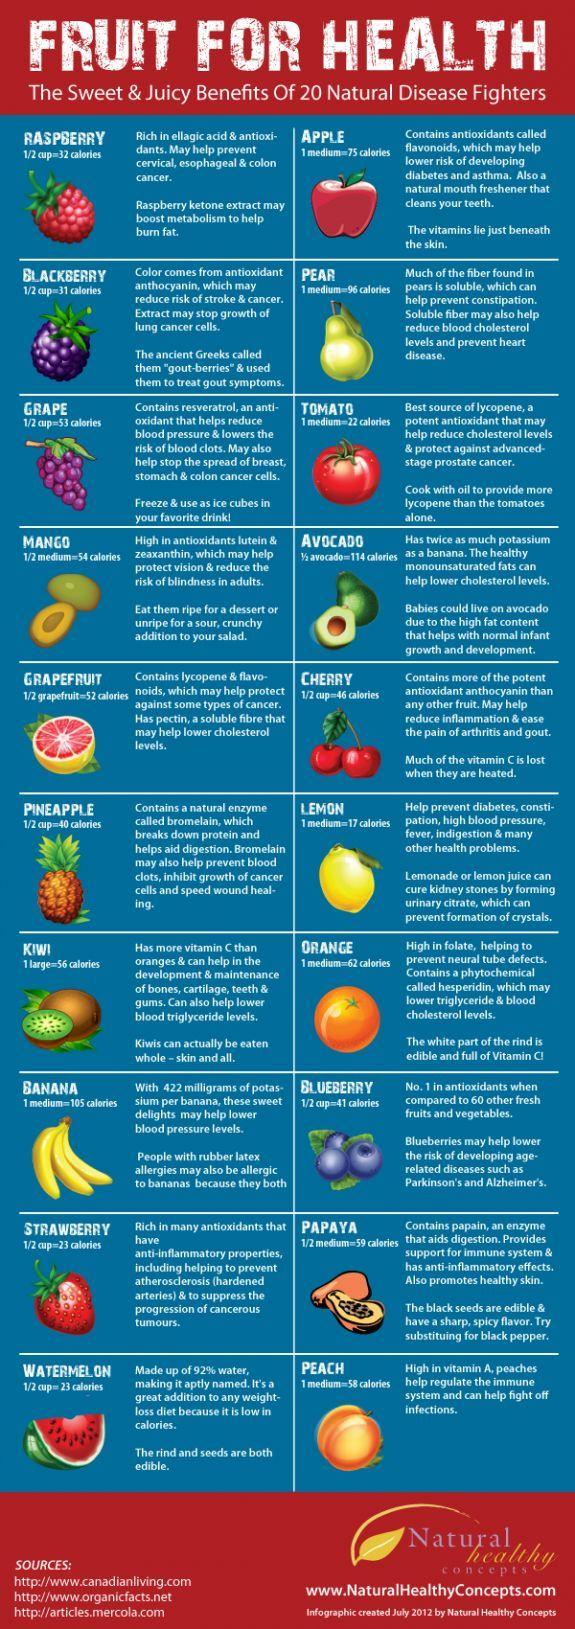 Fruit benefits and calories